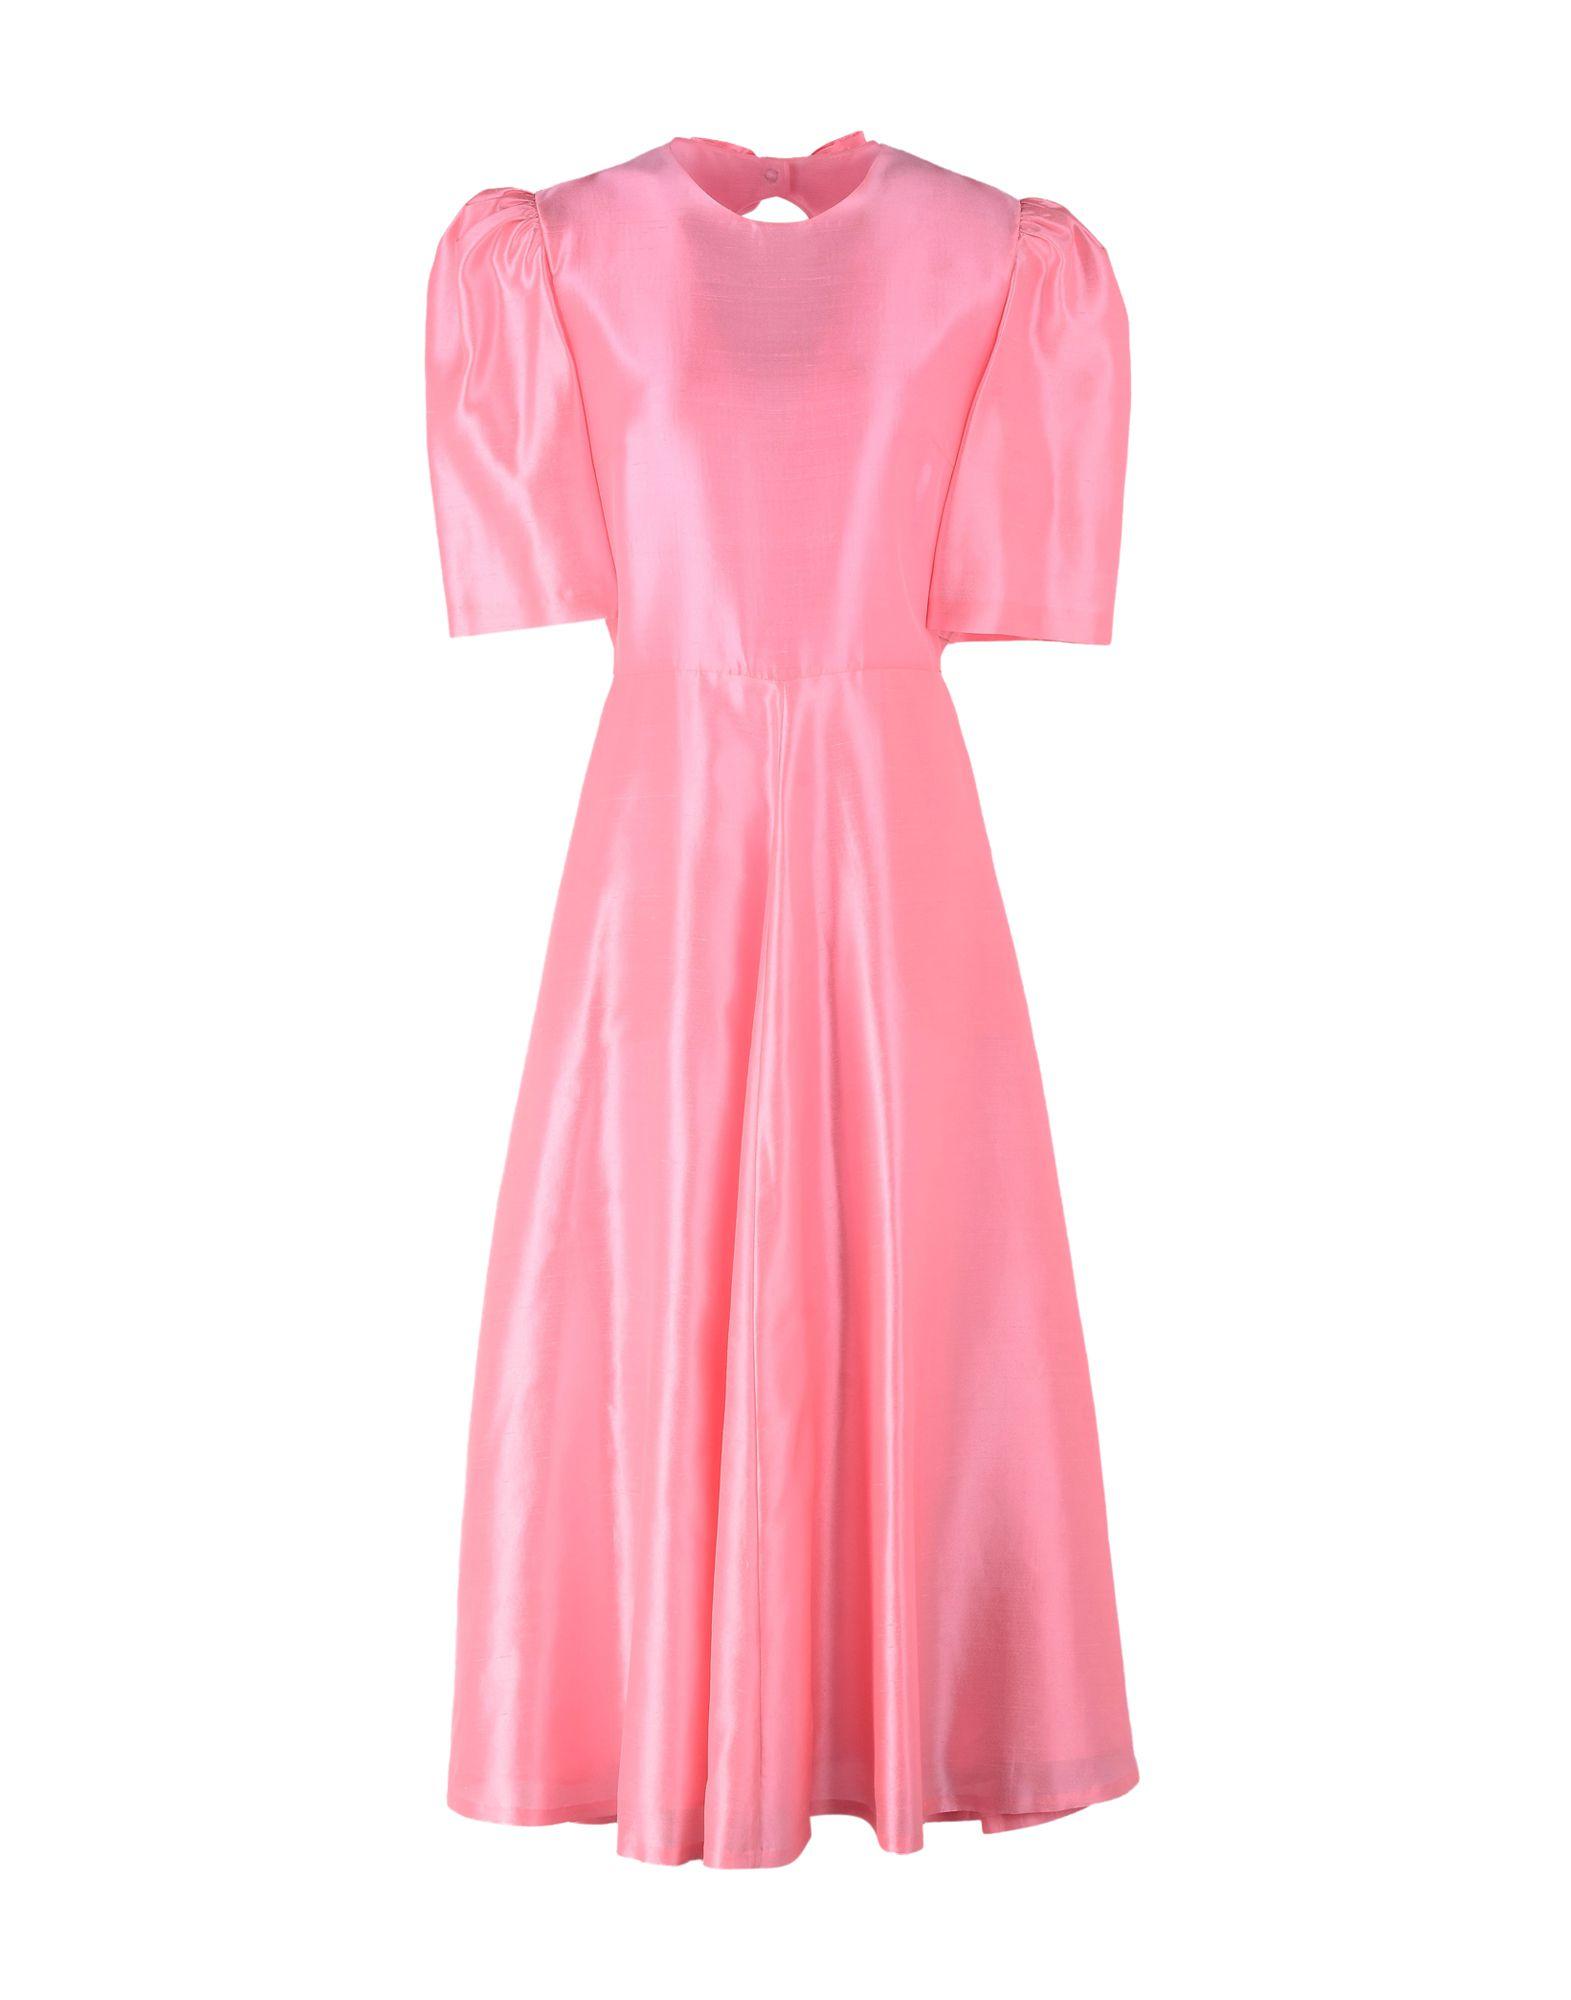 PUSHBUTTON Платье длиной 3/4 250vac 6a dpst 1no 1nc 4 terminal green mushroom momentary pushbutton switch